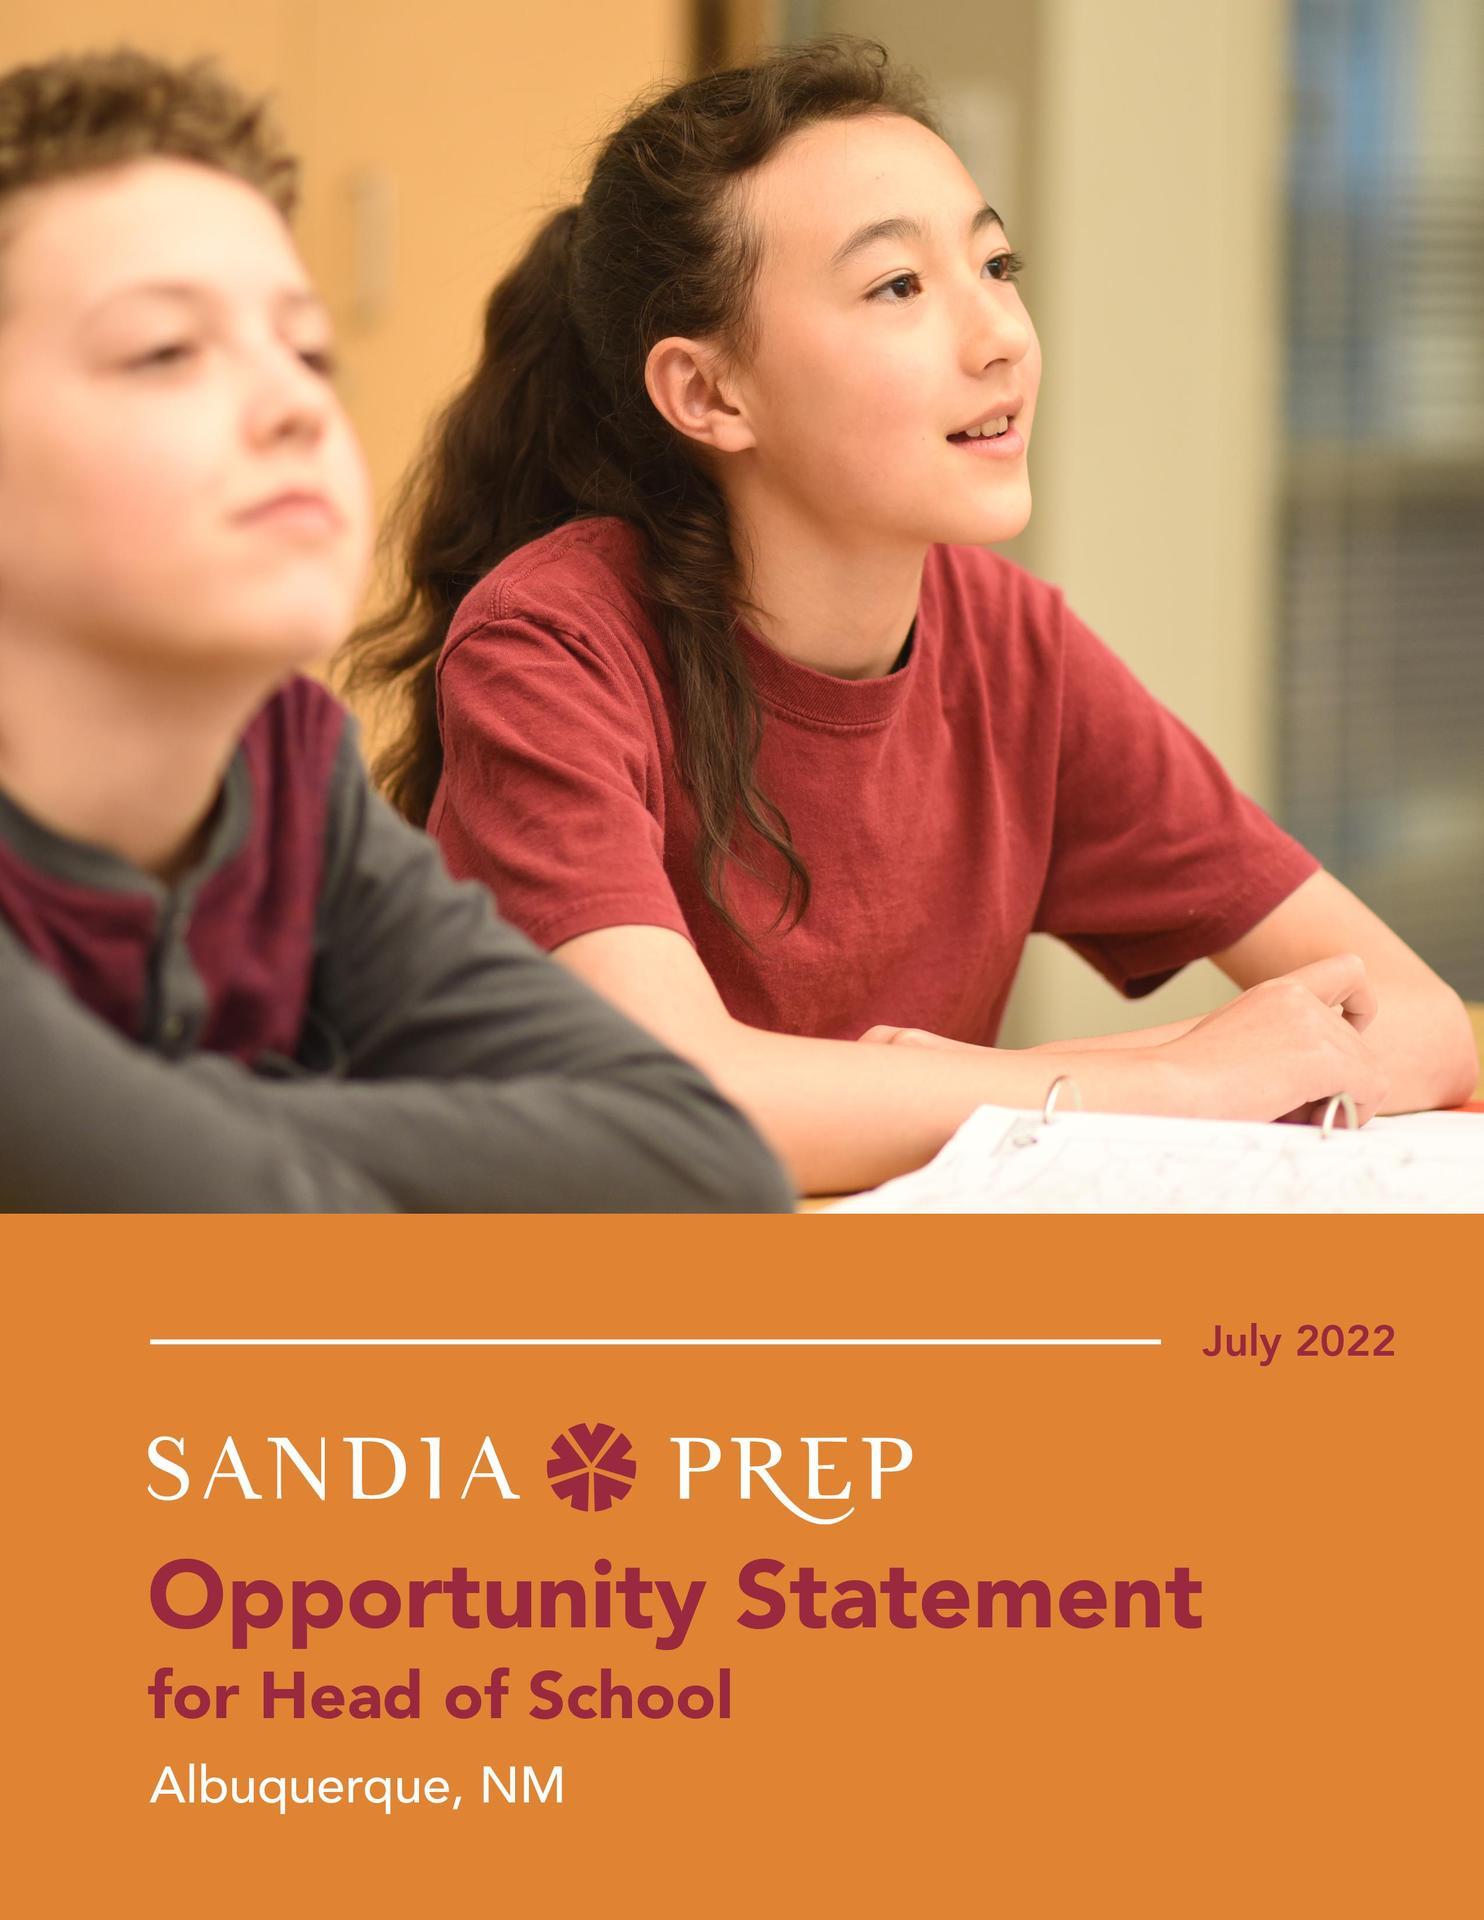 Sandia Prep HOS Statement of Opportunity